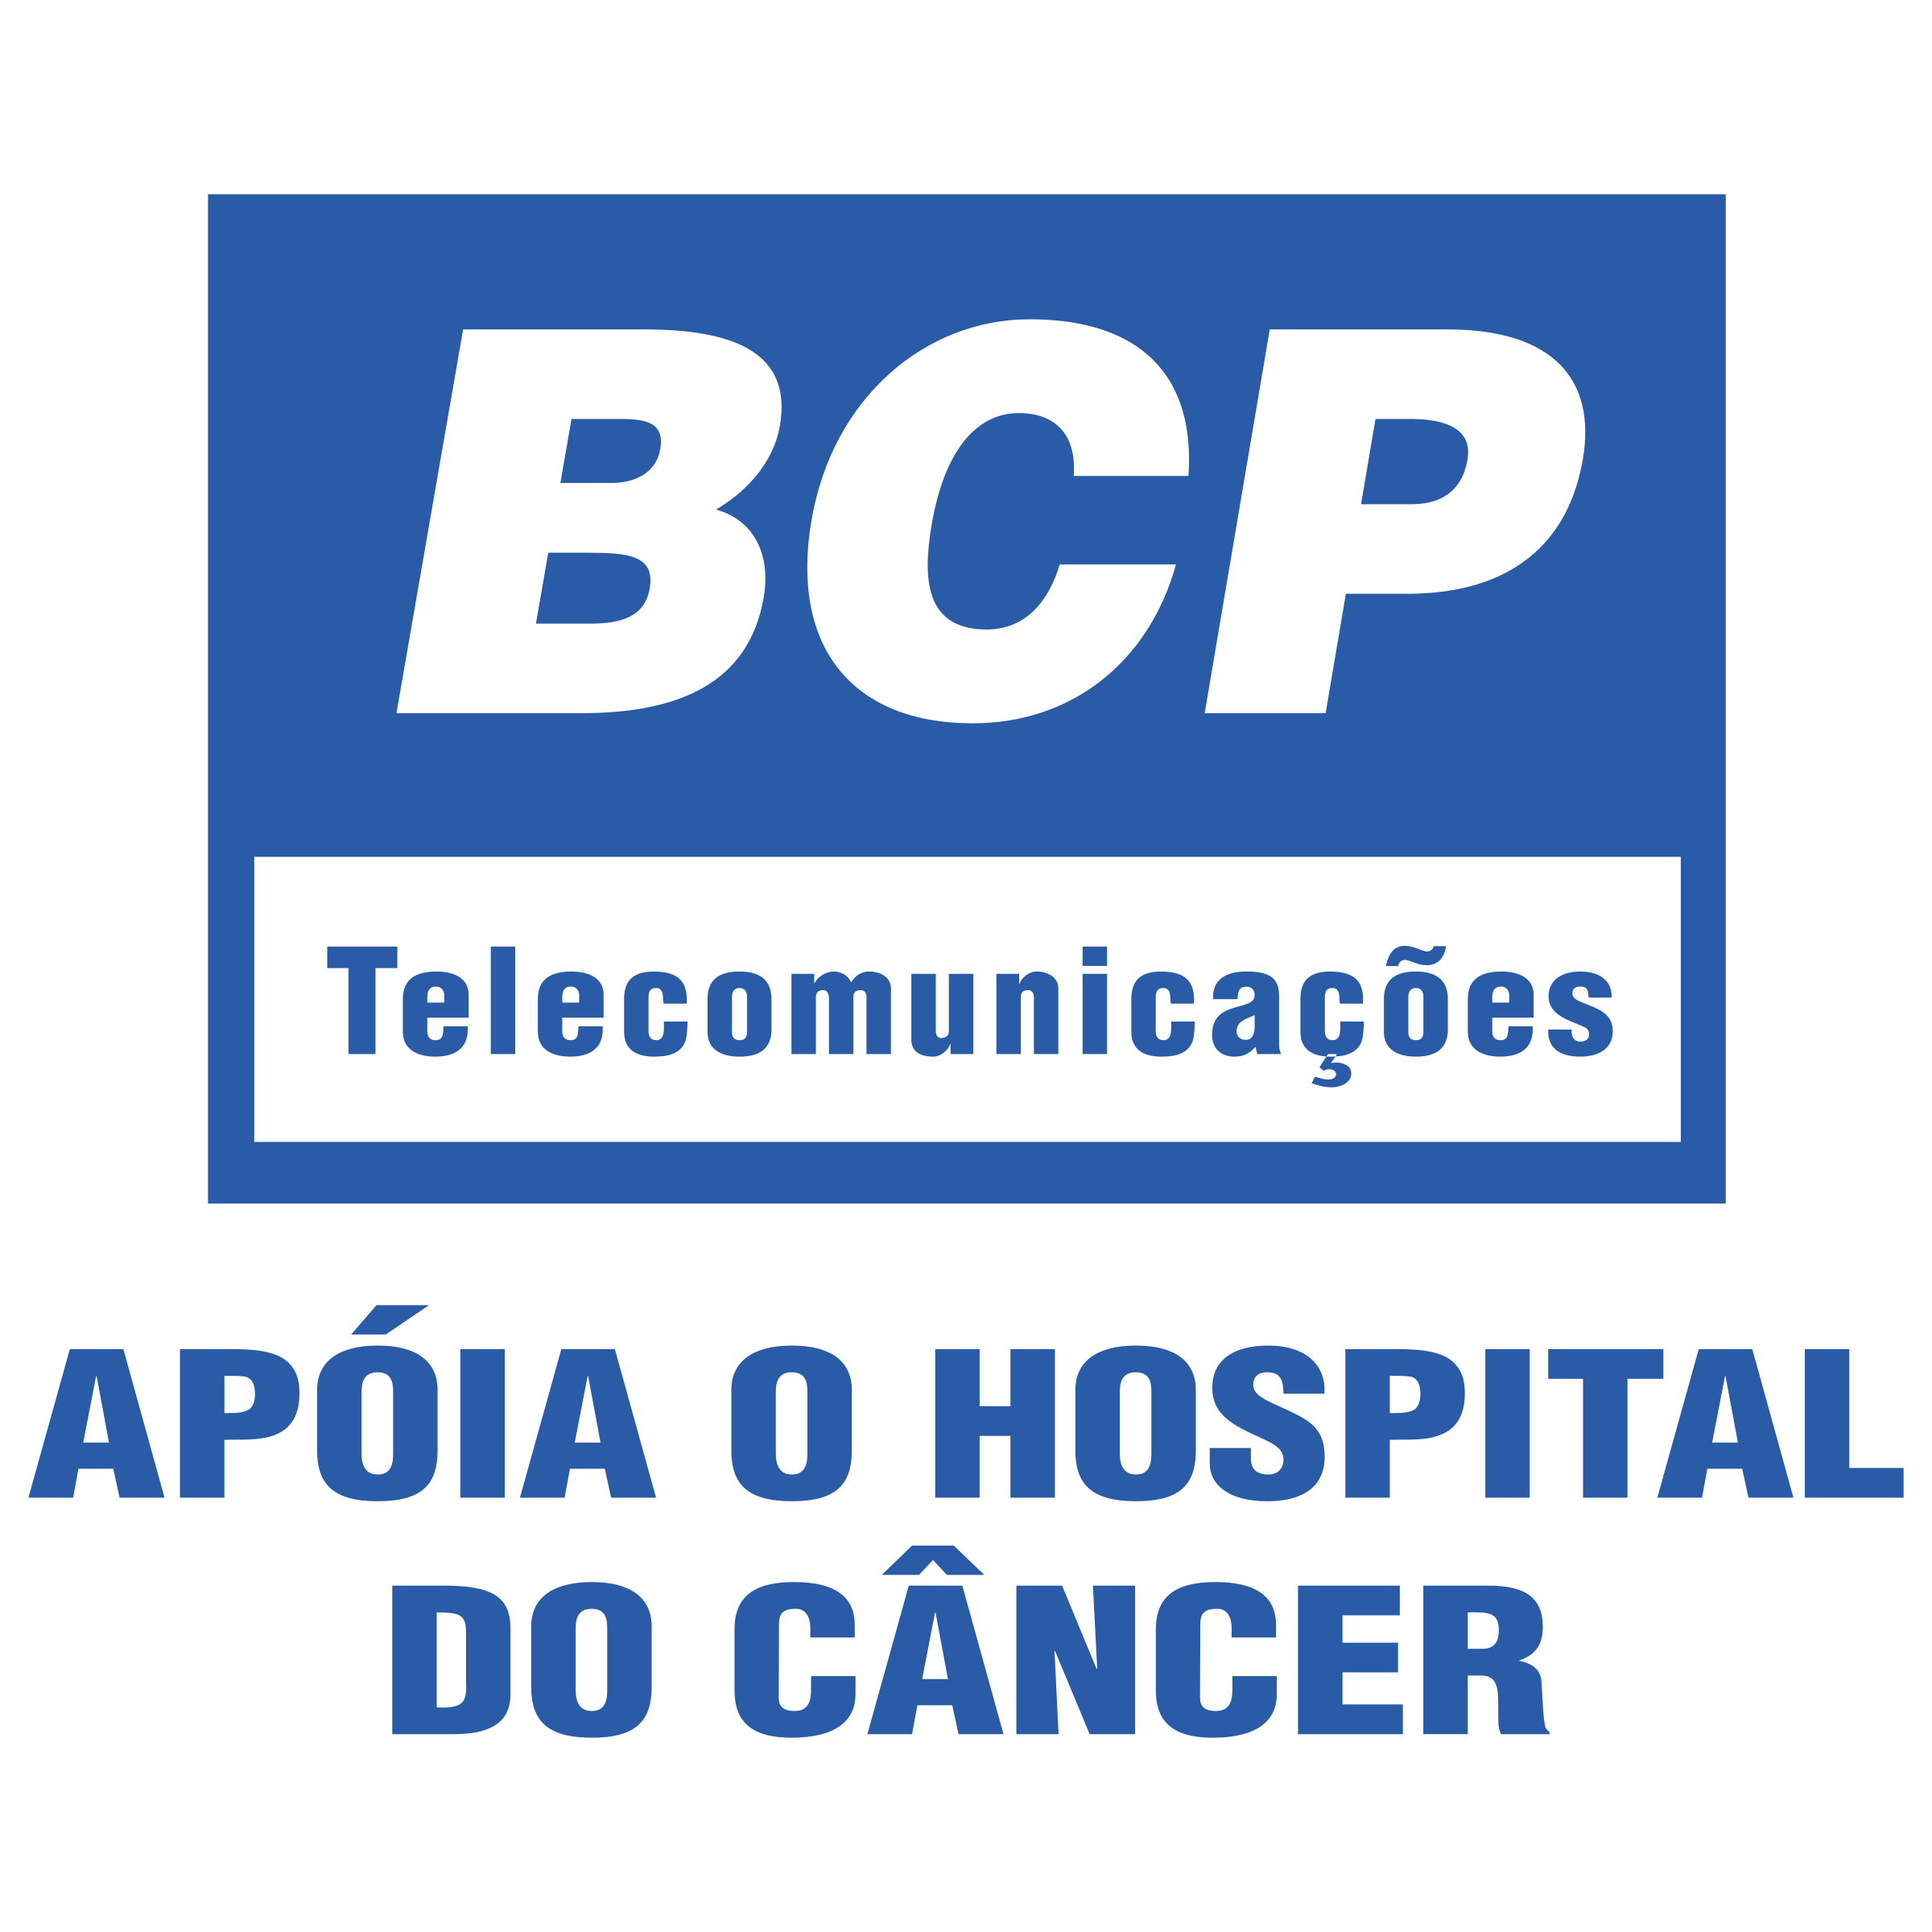 BCP 03 Logo PNG Transparent & SVG Vector.